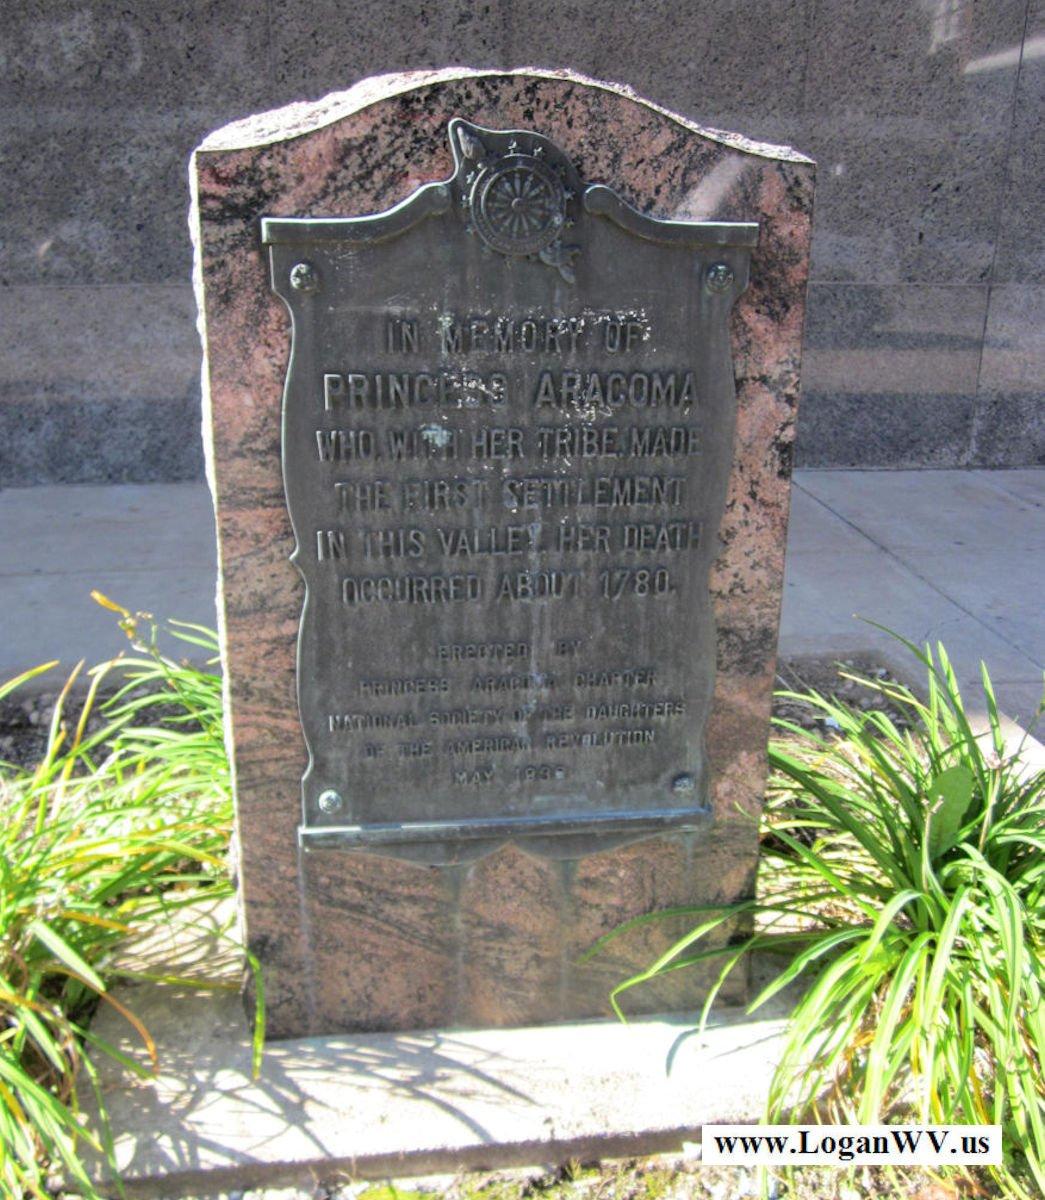 Aracoma Historical Marker, Court House, Logan, WV